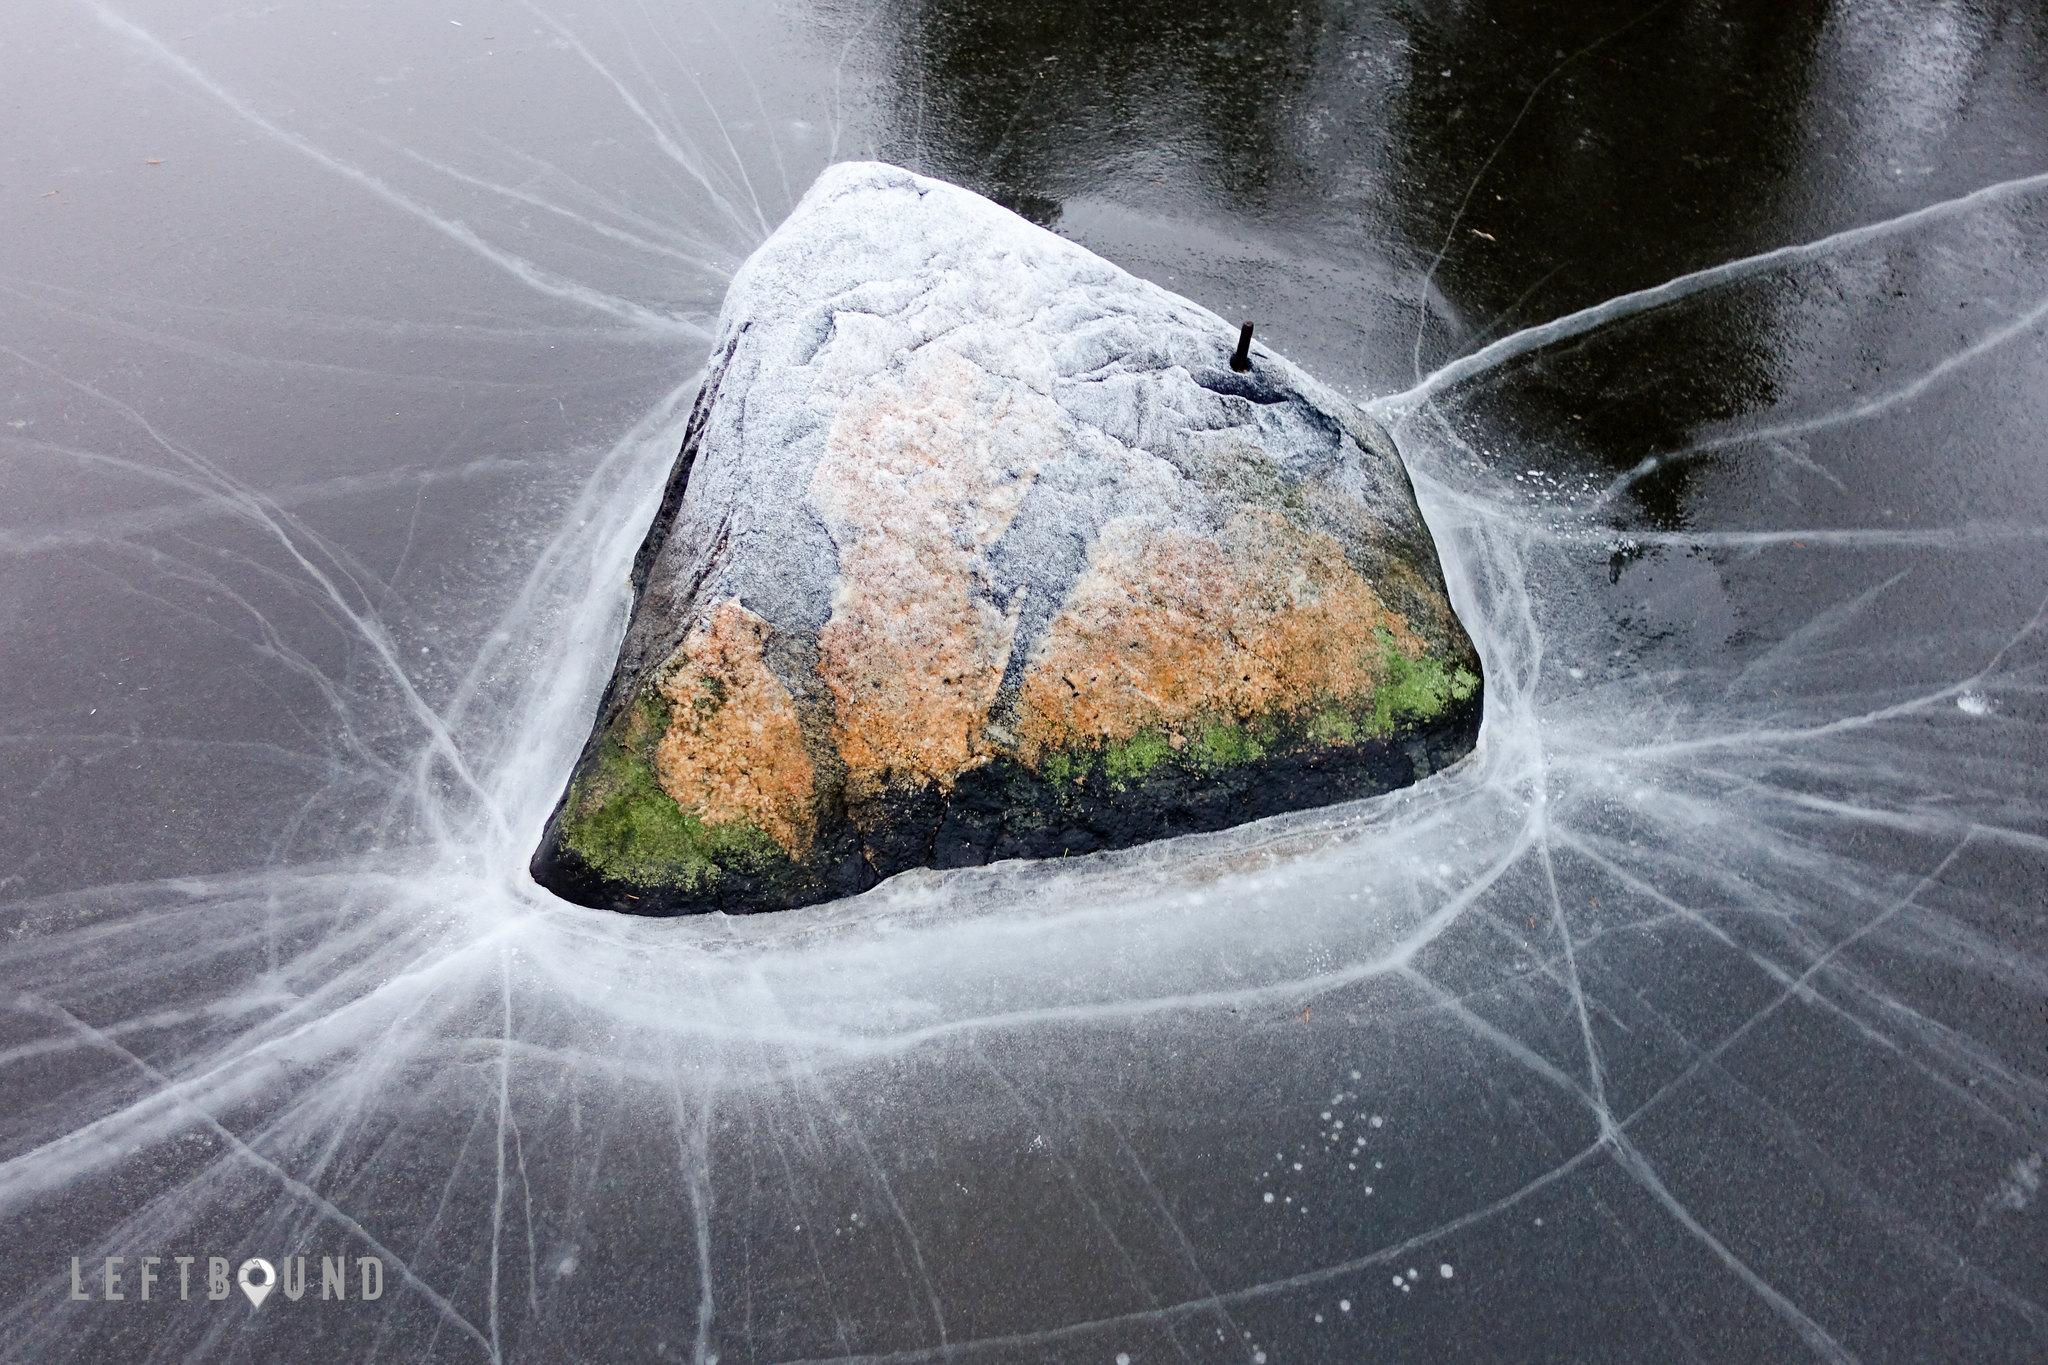 Giant's stone